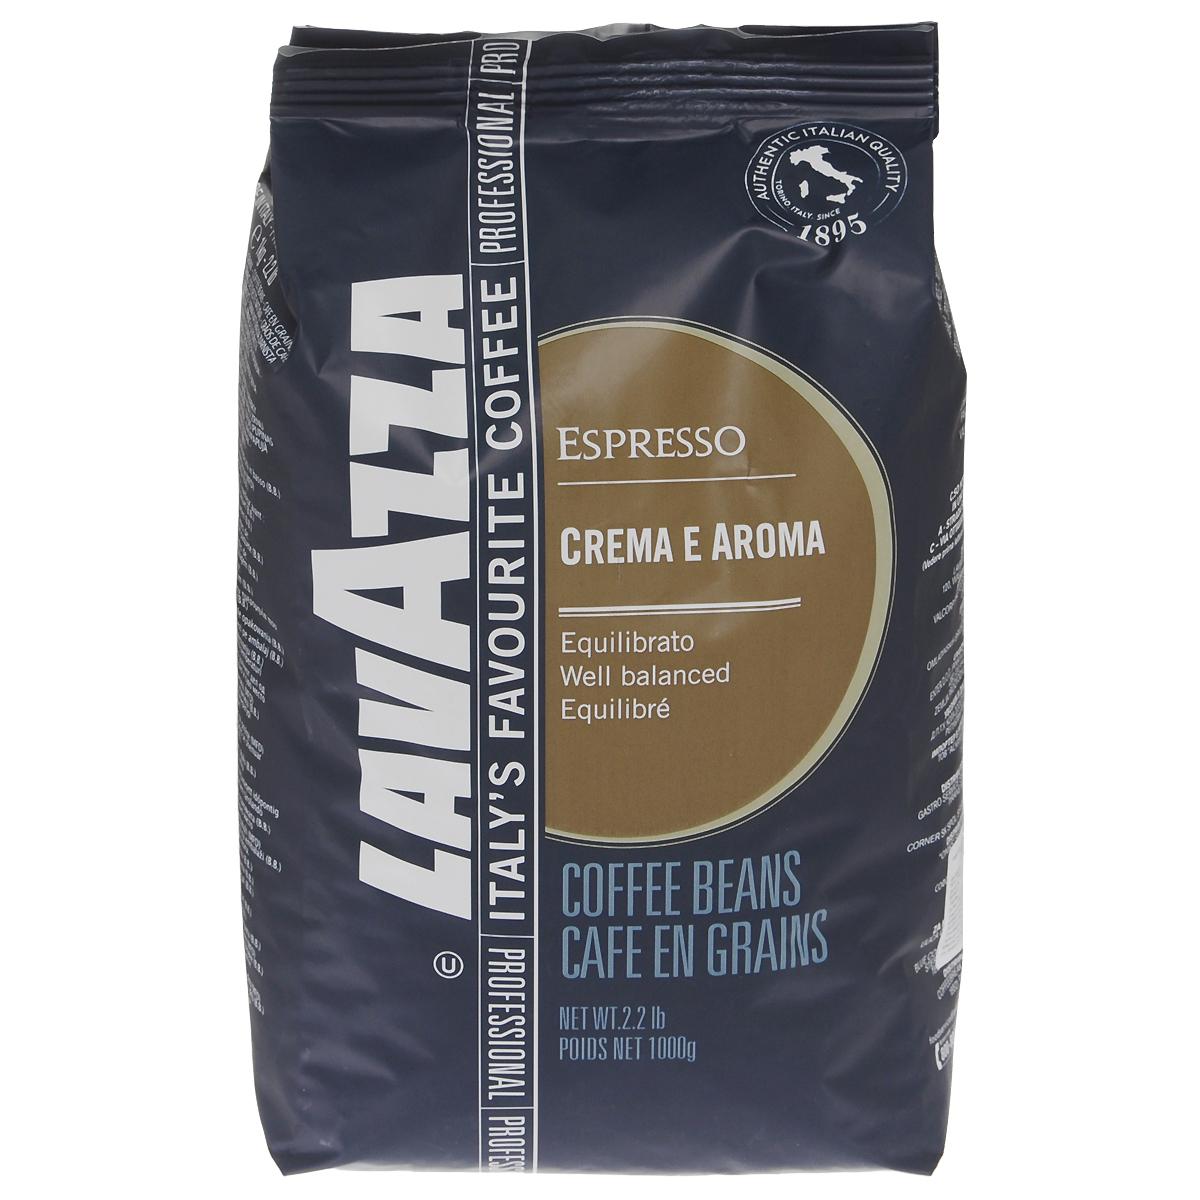 Lavazza Crema e Aroma Espresso кофе в зернах, 1 кг lavazza crema e aroma 1000 beans крем арома зерно вакуумная упаковка